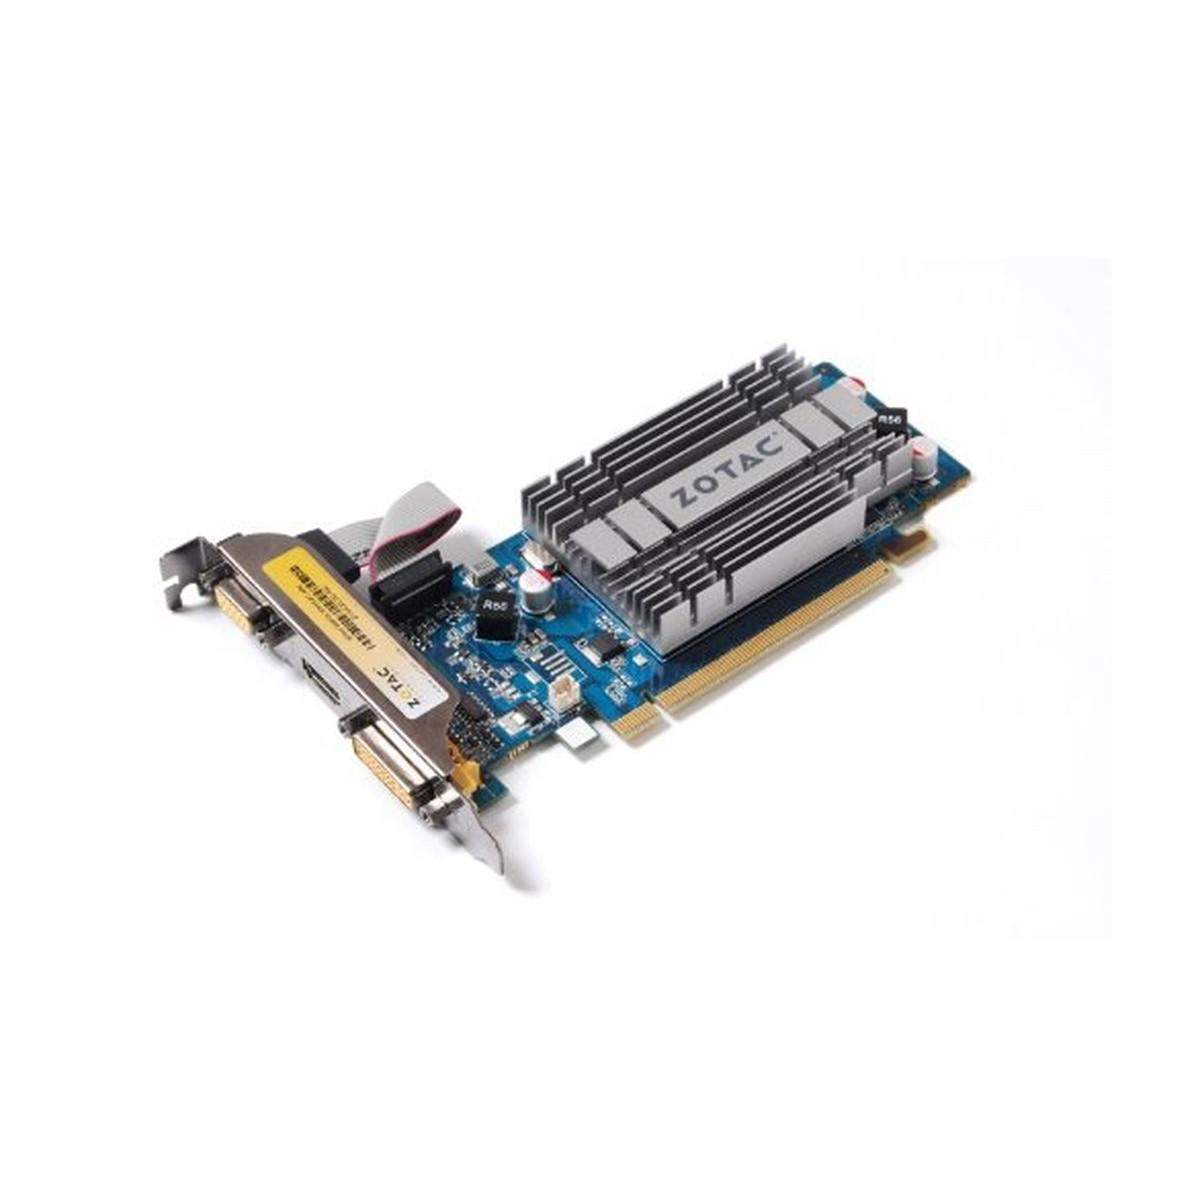 ZOTAC GeFORCE 8400 GS 1GB VGA HDMI DVI PCI-Ex16